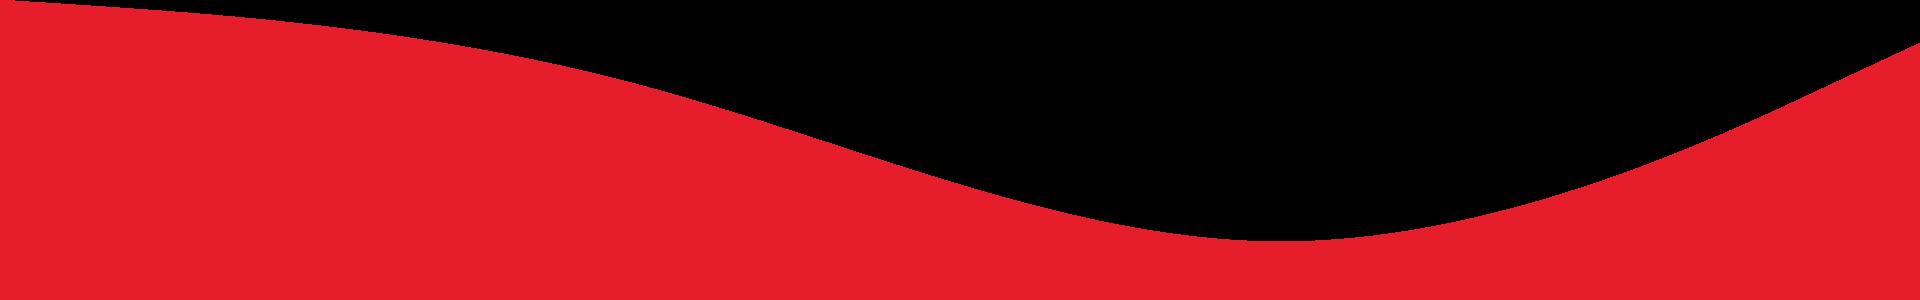 strisha e kuqe Coca-Cola